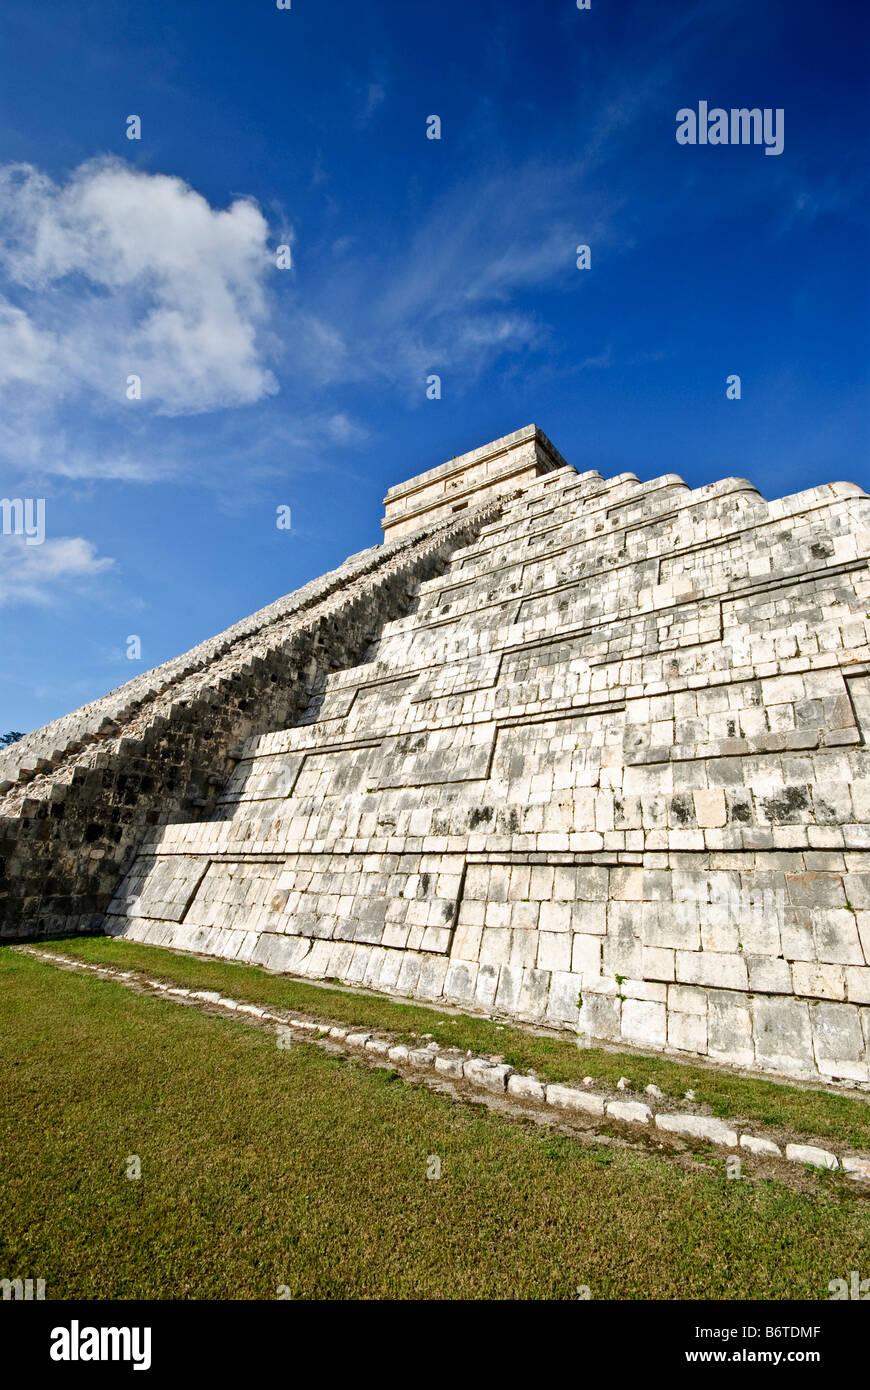 CHICHEN ITZA, Mexico - El Castillo (also known as Temple of Kuklcan) at the ancient Mayan ruins at Chichen Itza, - Stock Image